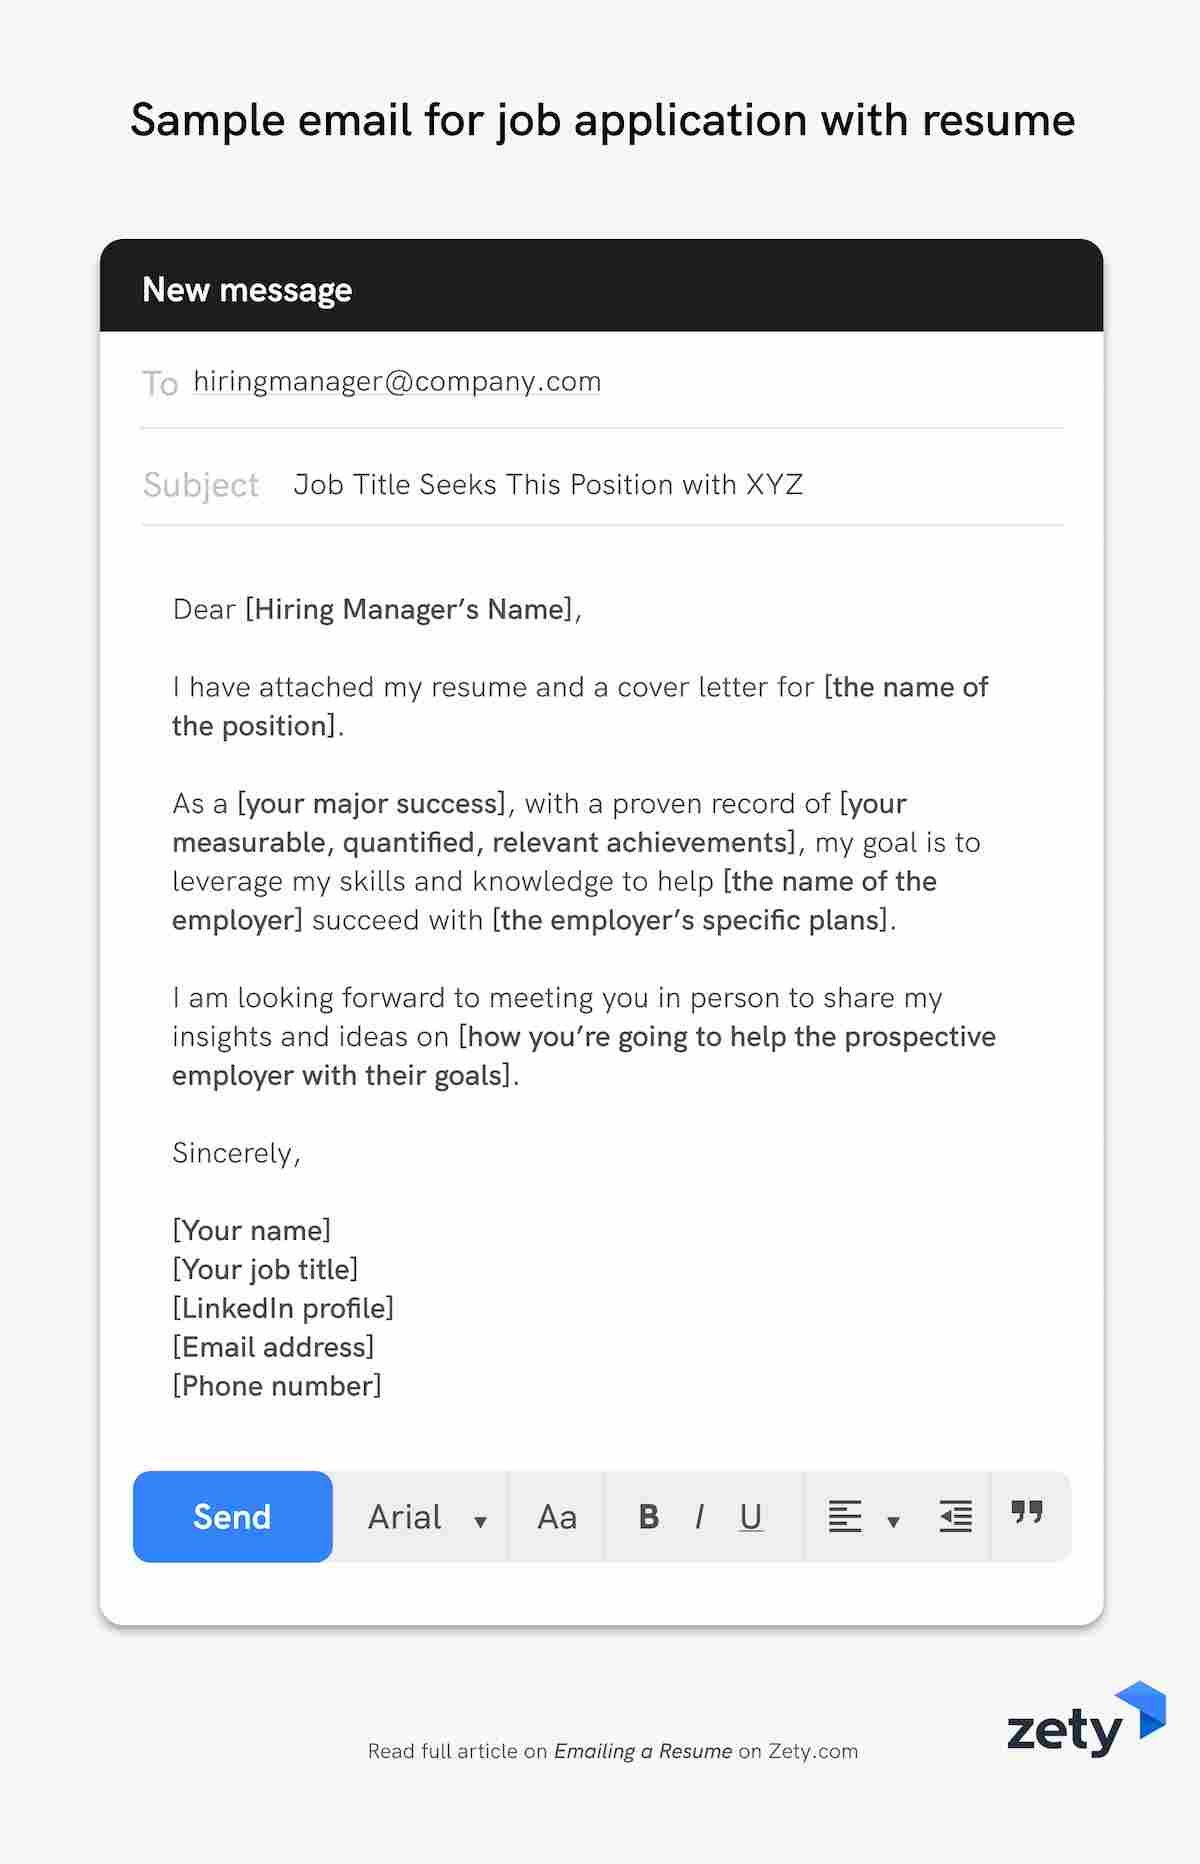 Email to Send Resume to Recruiter Sample Emailing A Resume: 12lancarrezekiq Job Application Email Samples